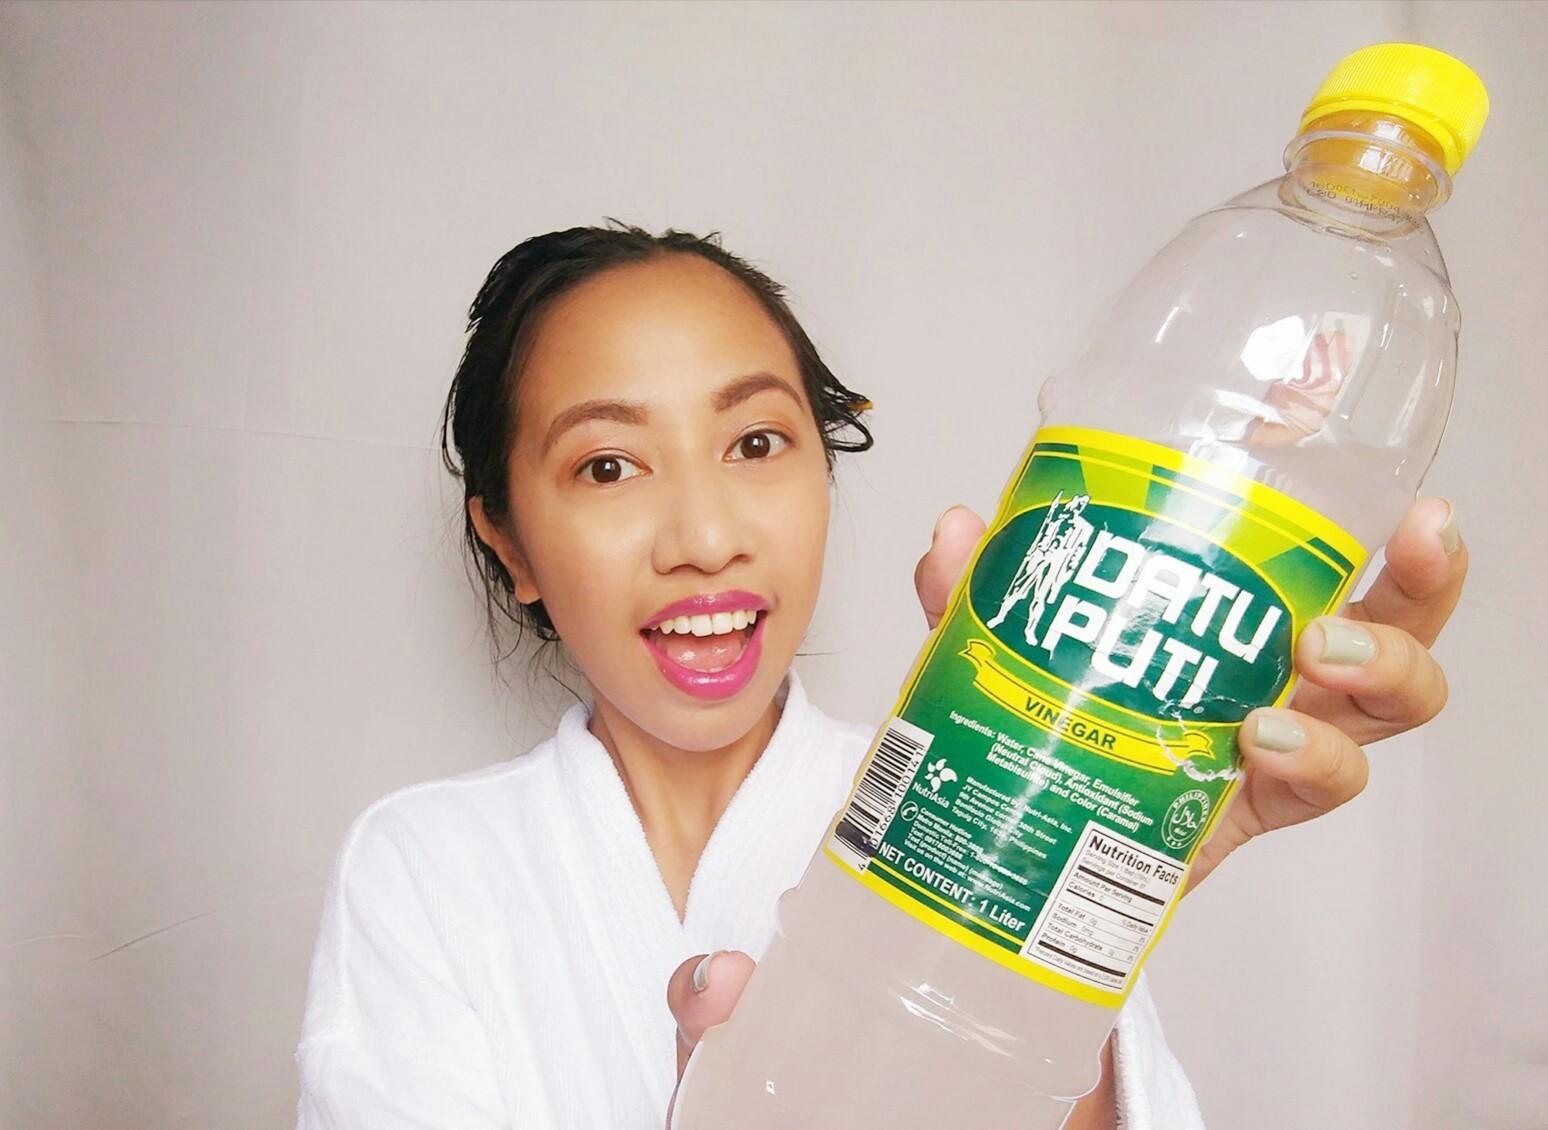 Datu Puti vinegar, haircare hacks, cheap anti-dandruff treatment, anti-dandruff